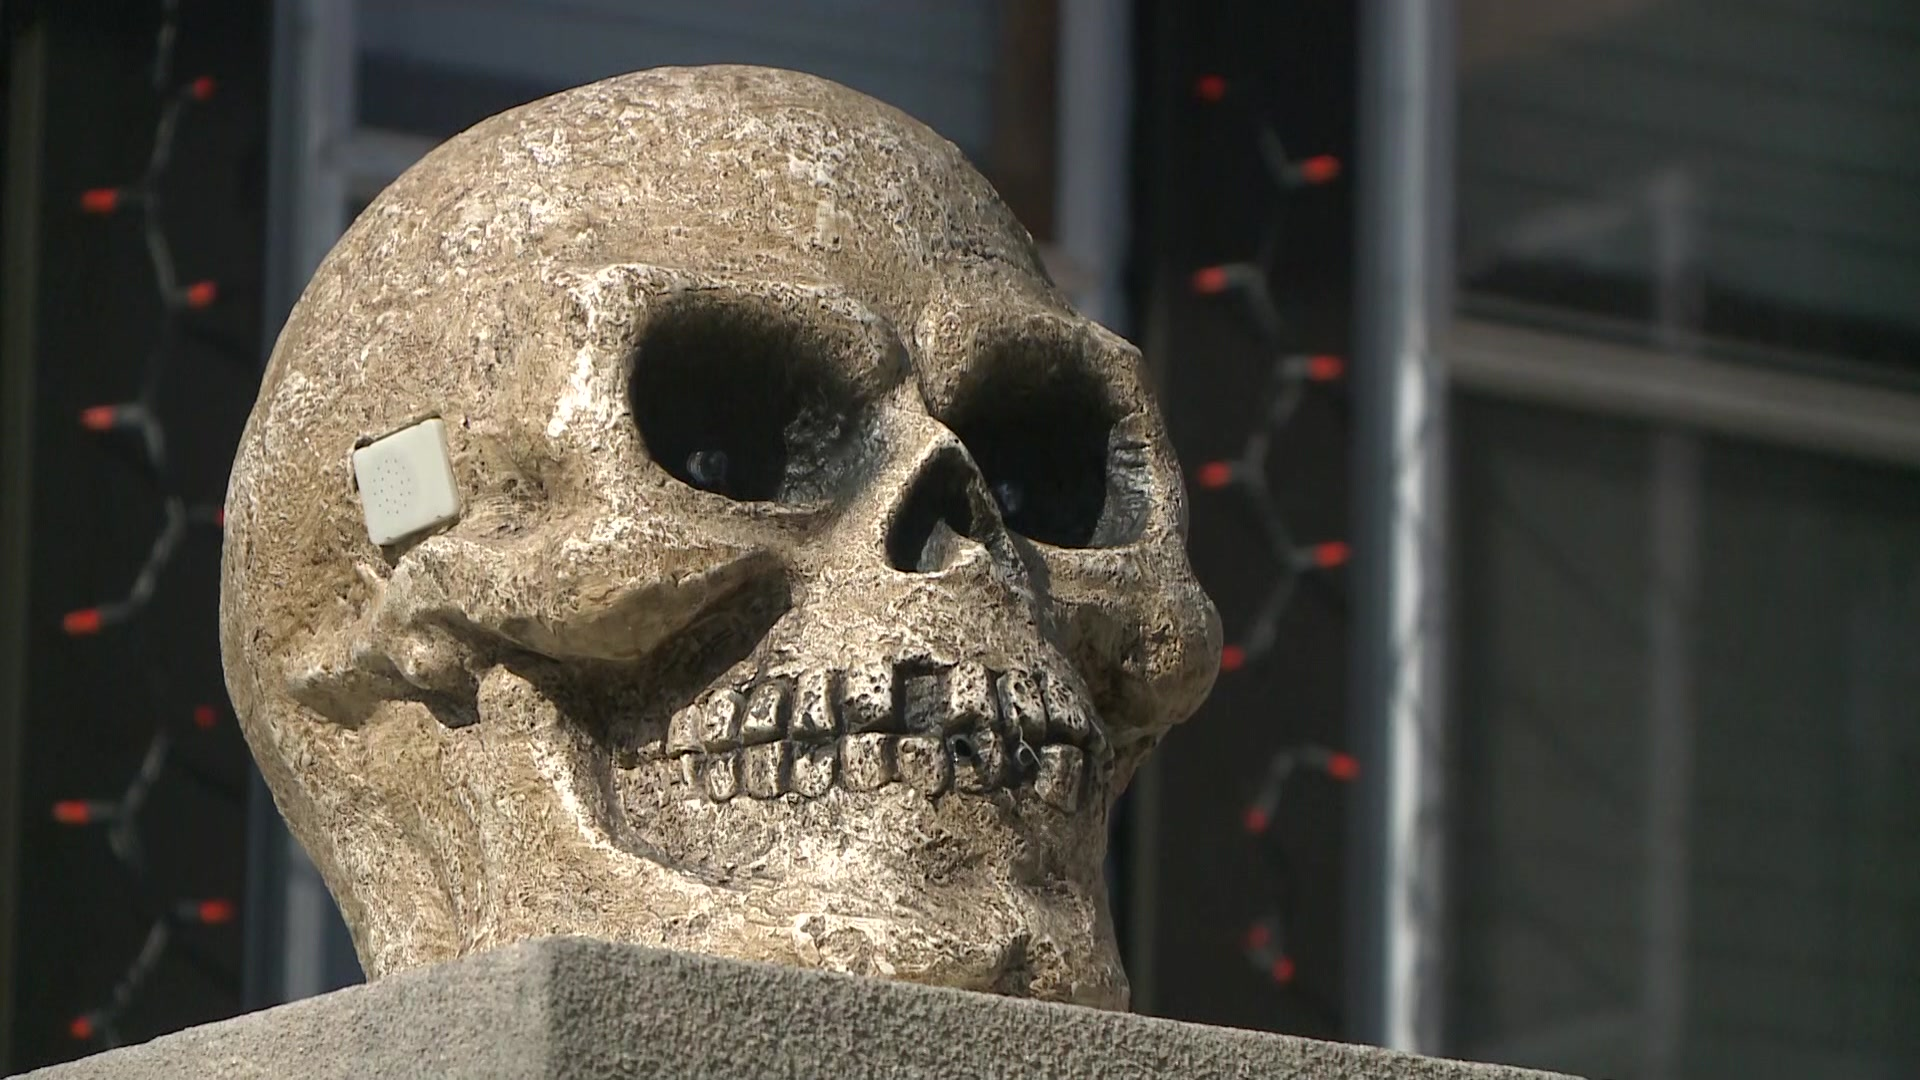 Homeowner upset after expensive Halloween decorations stolen